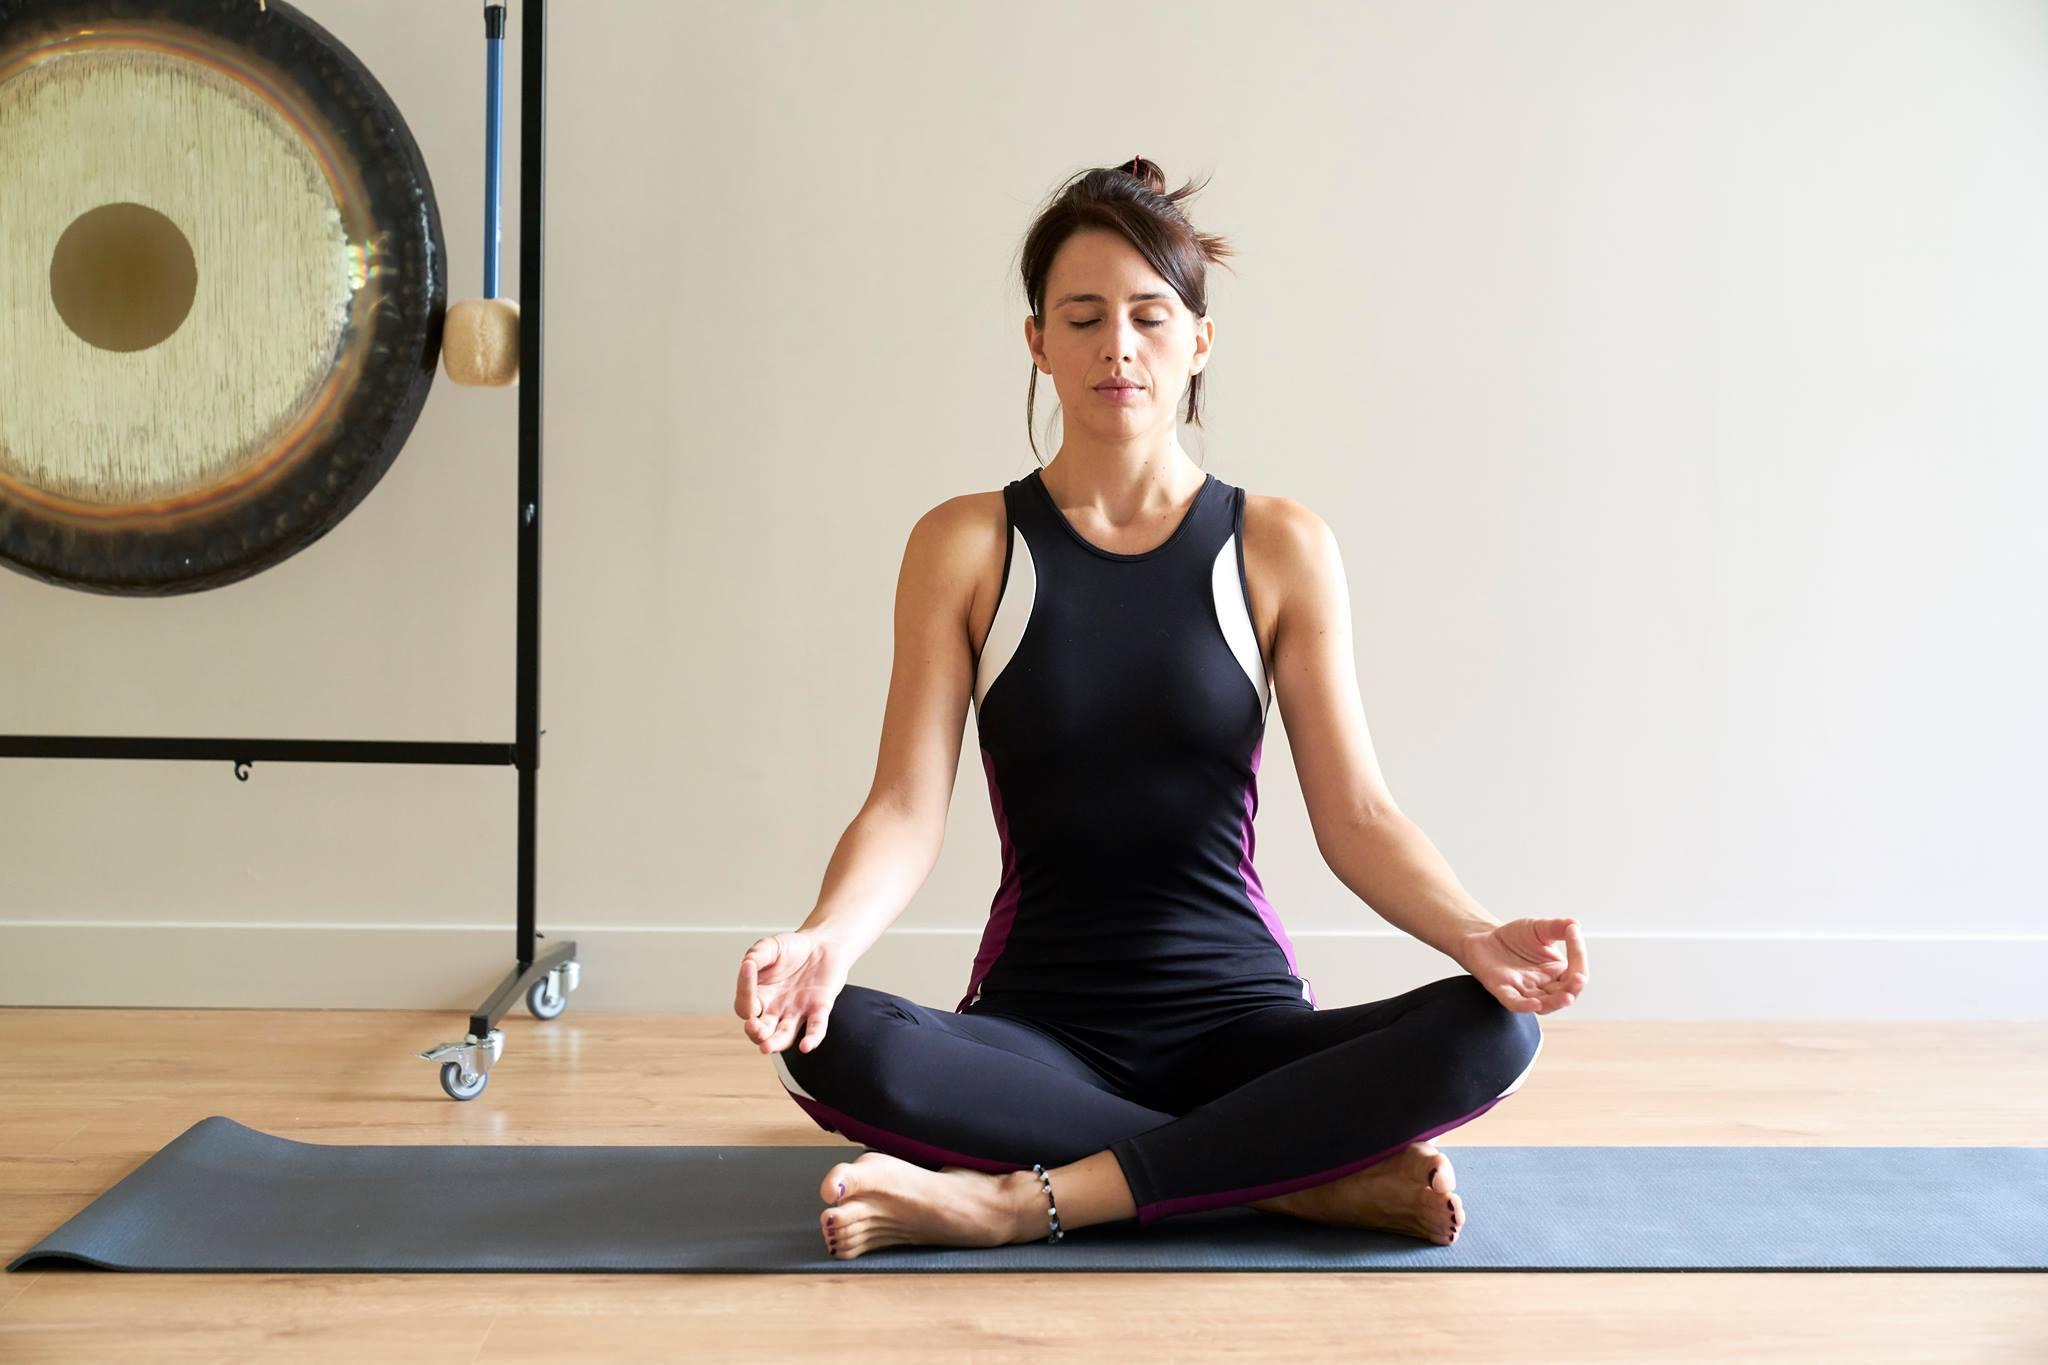 8 remansos de paz para practicar yoga en Madrid 0330201689d4